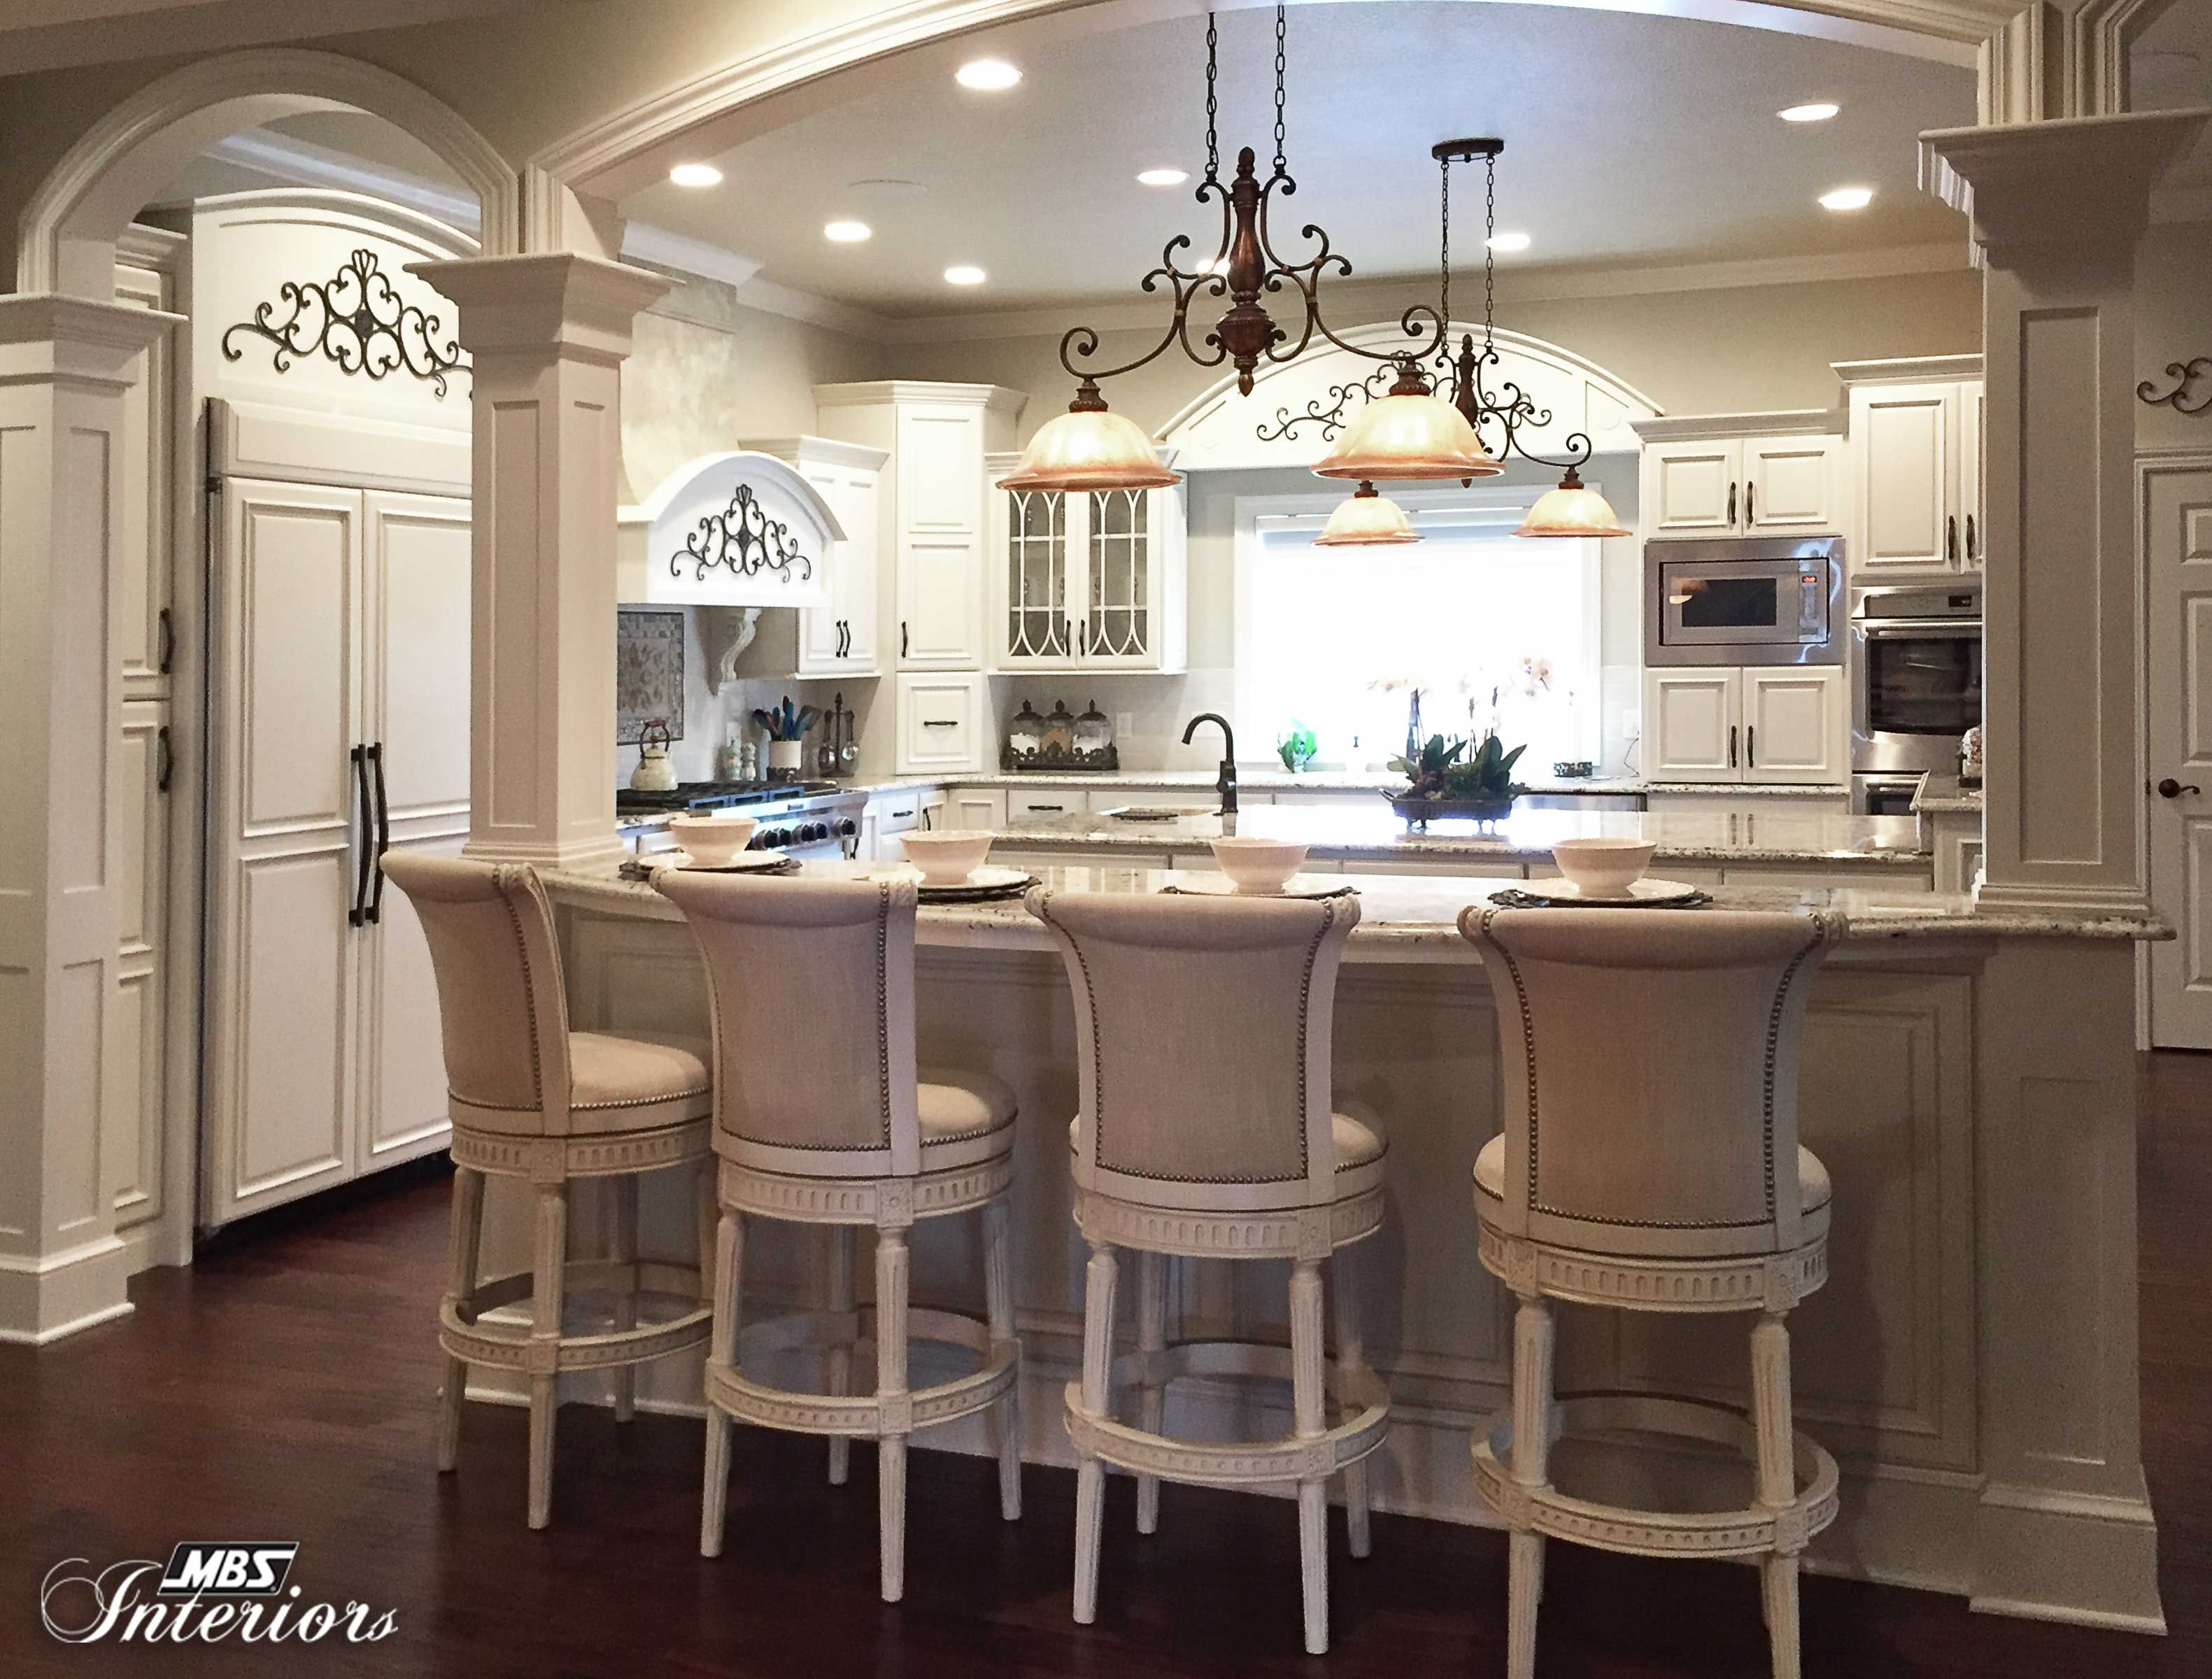 French Colonial Kitchen Trendy Kitchen Backsplash Victorian Kitchen New Kitchen Interior